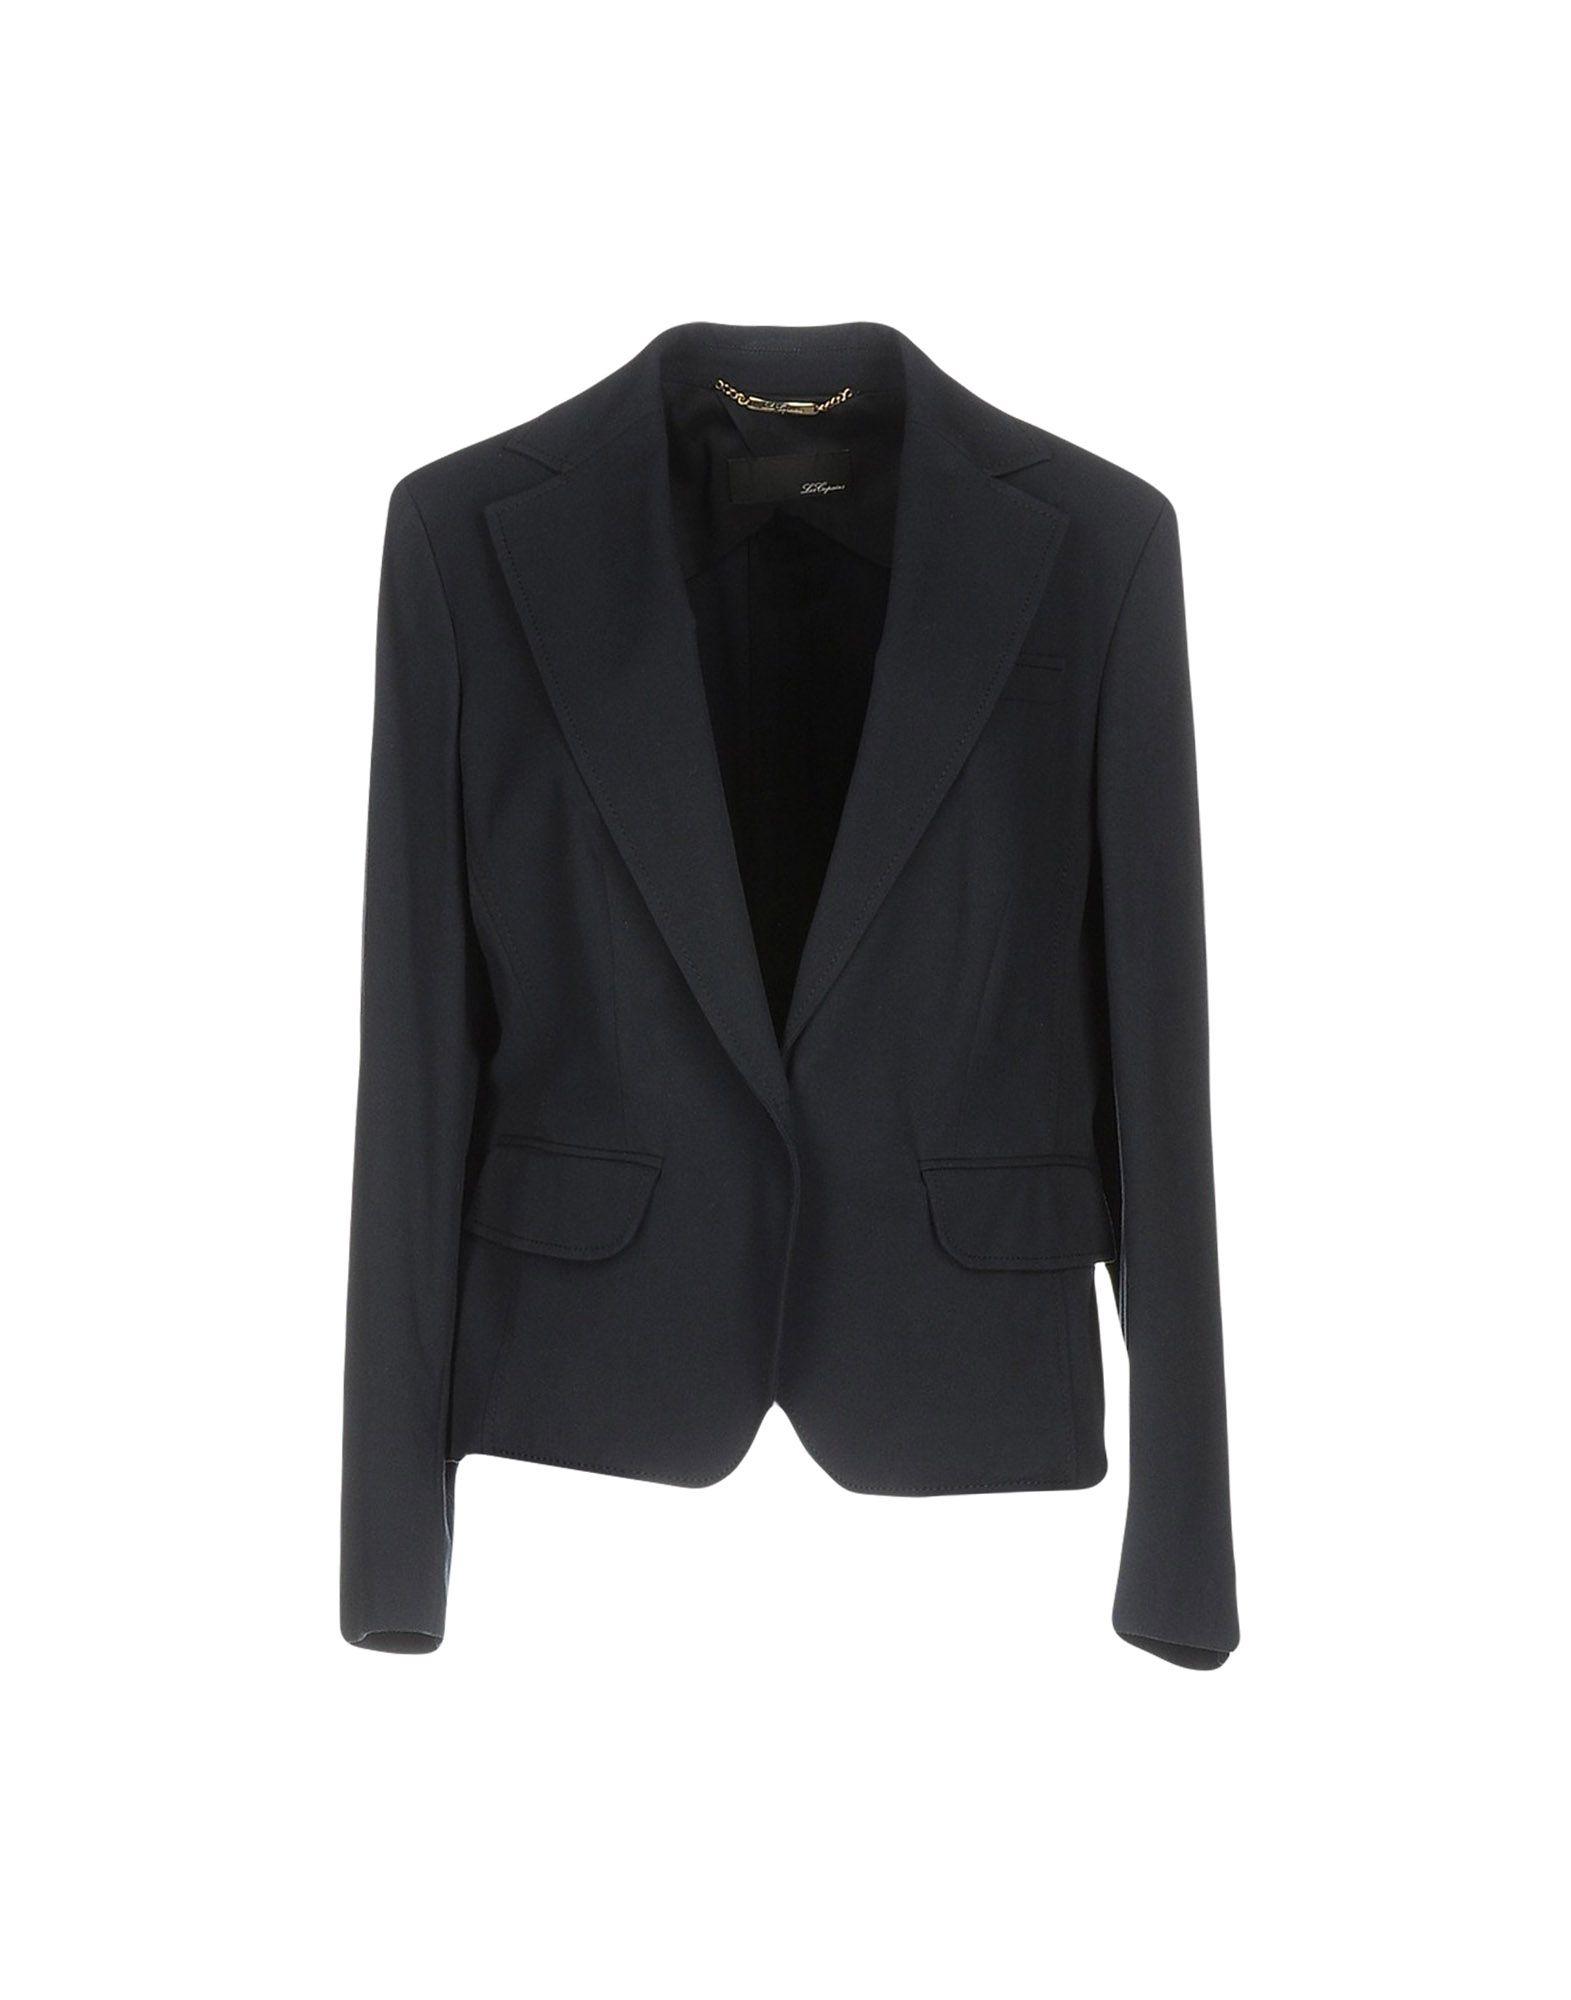 LES COPAINS Damen Jackett Farbe Dunkelblau Größe 7 - broschei